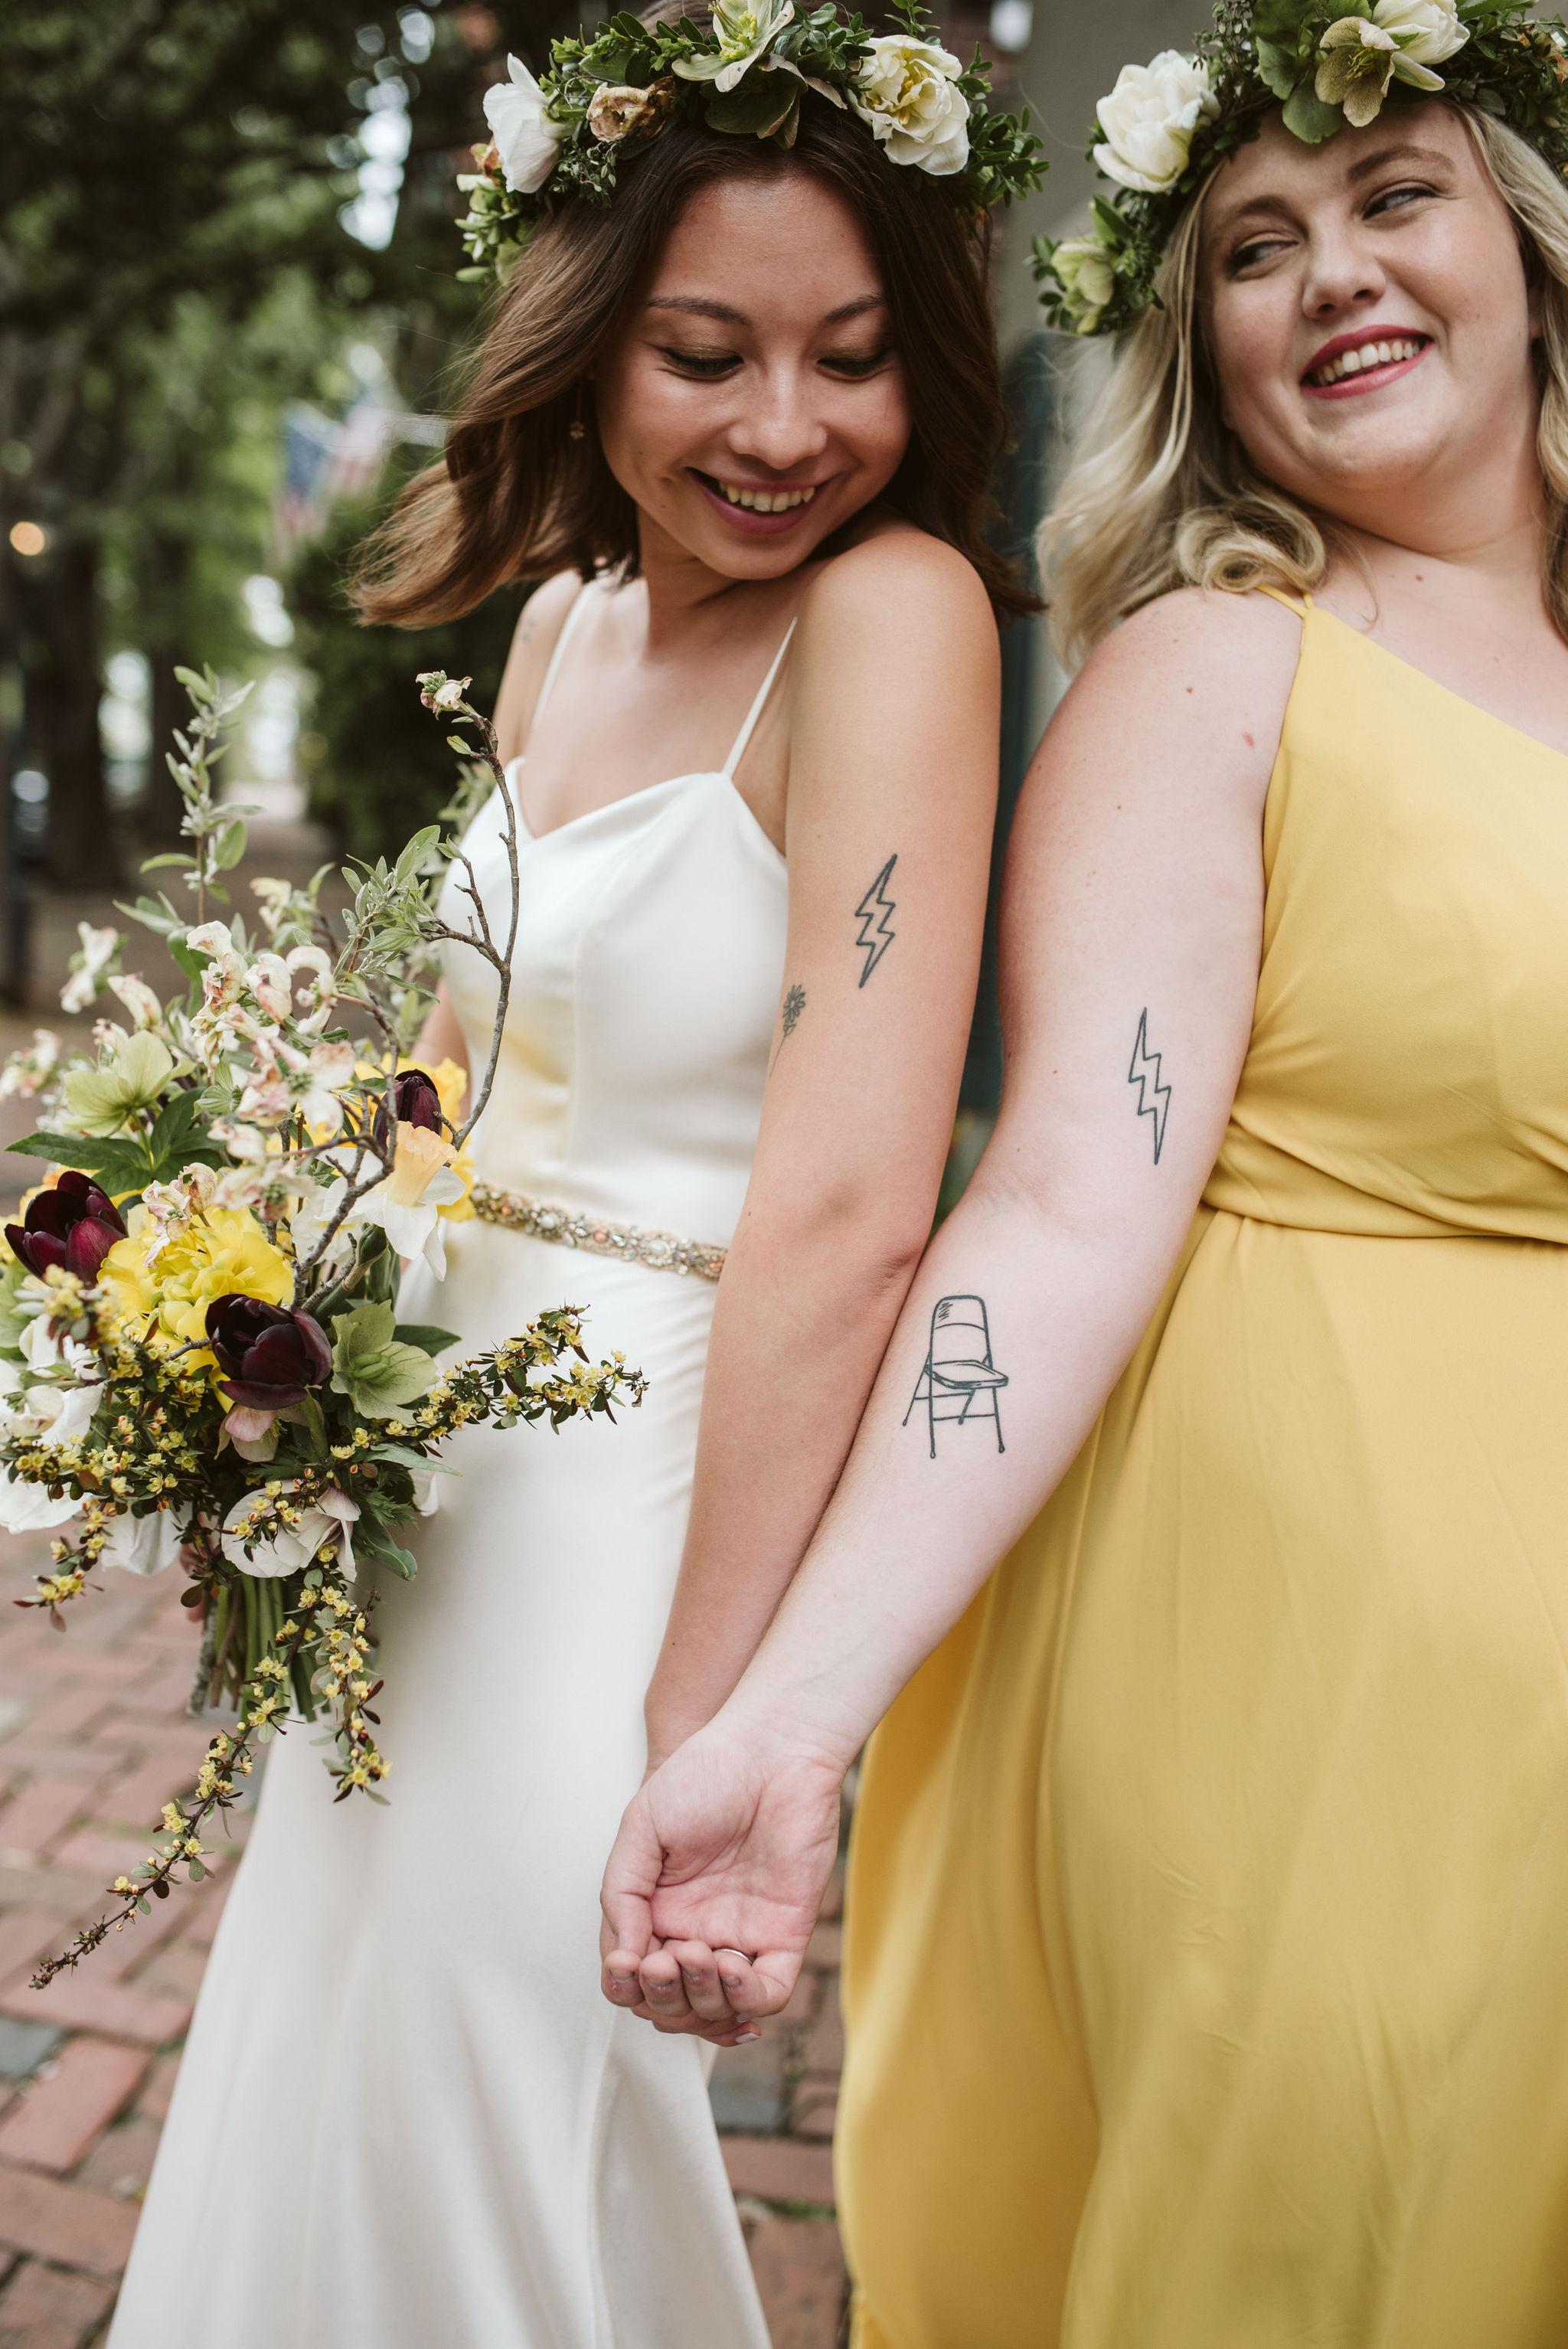 Katie+Jake'sWedding-Color-190.jpg